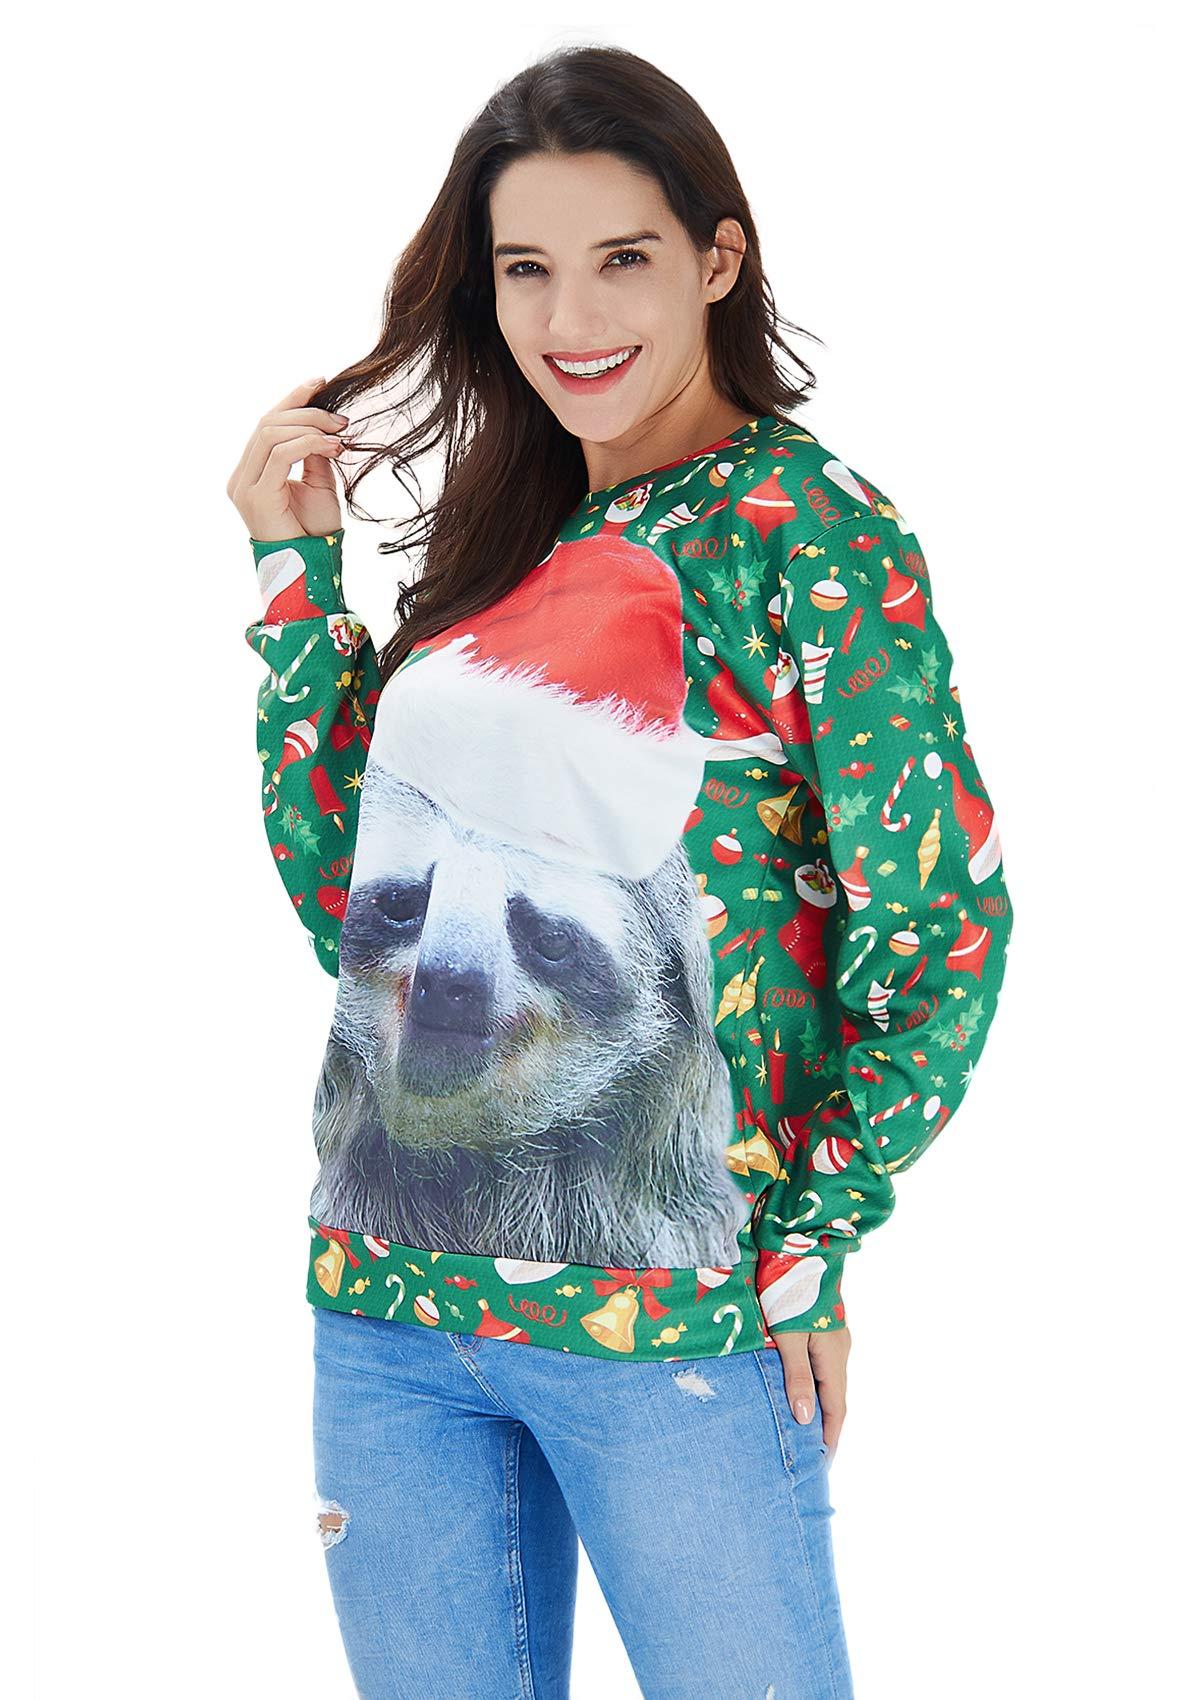 RAISEVERN Unisex Ugly Christmas Sloth Decoration Print Funny Xmas Pullover Sweater Sweatshirt for Teen Juniors